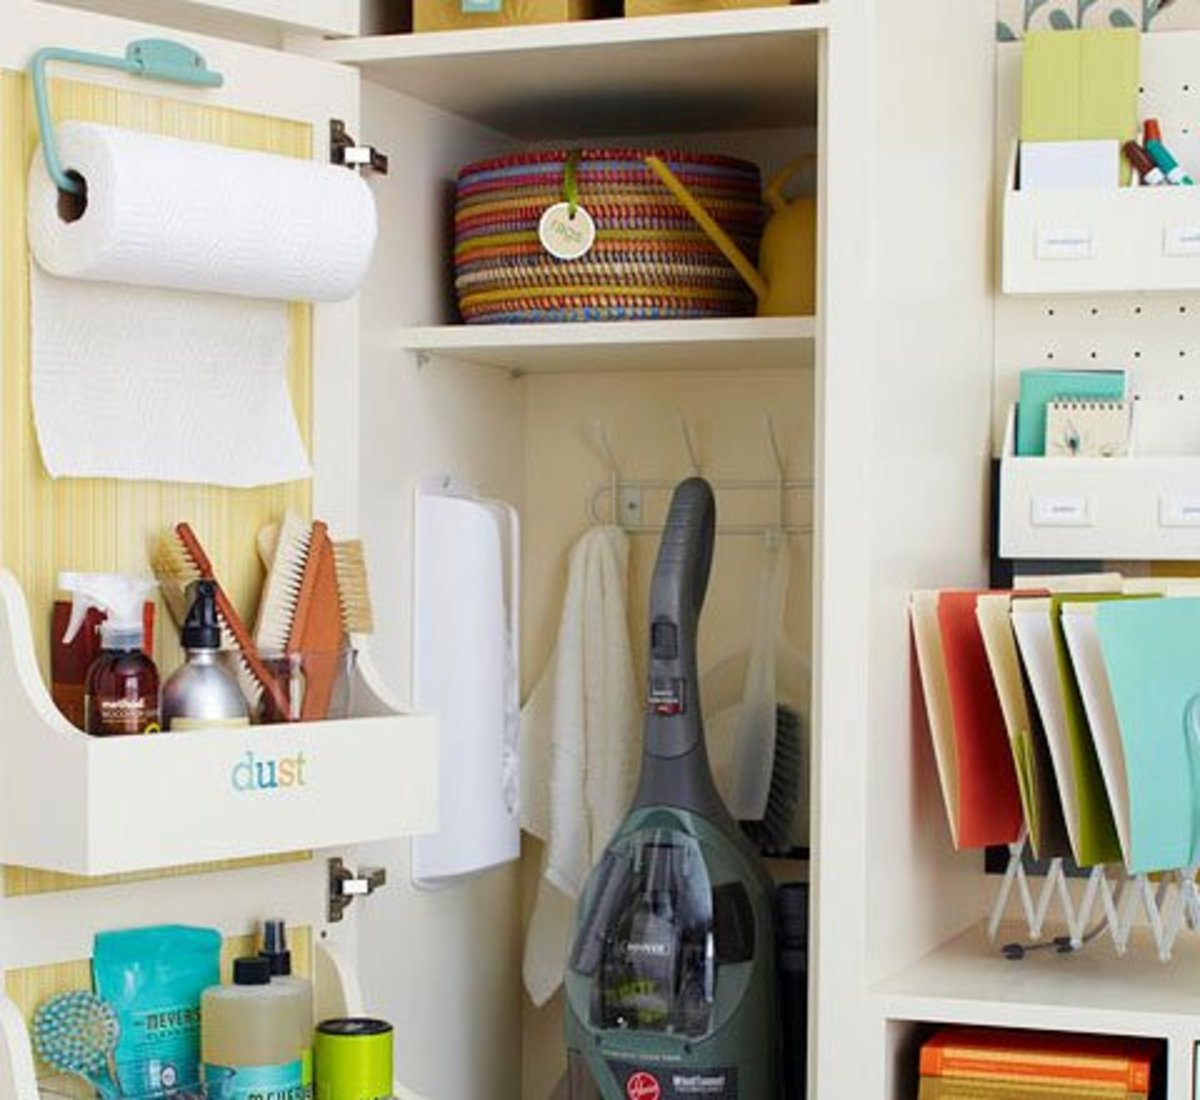 Cupboard Door Organizer Rack | Easy Organization Ideas for the Home